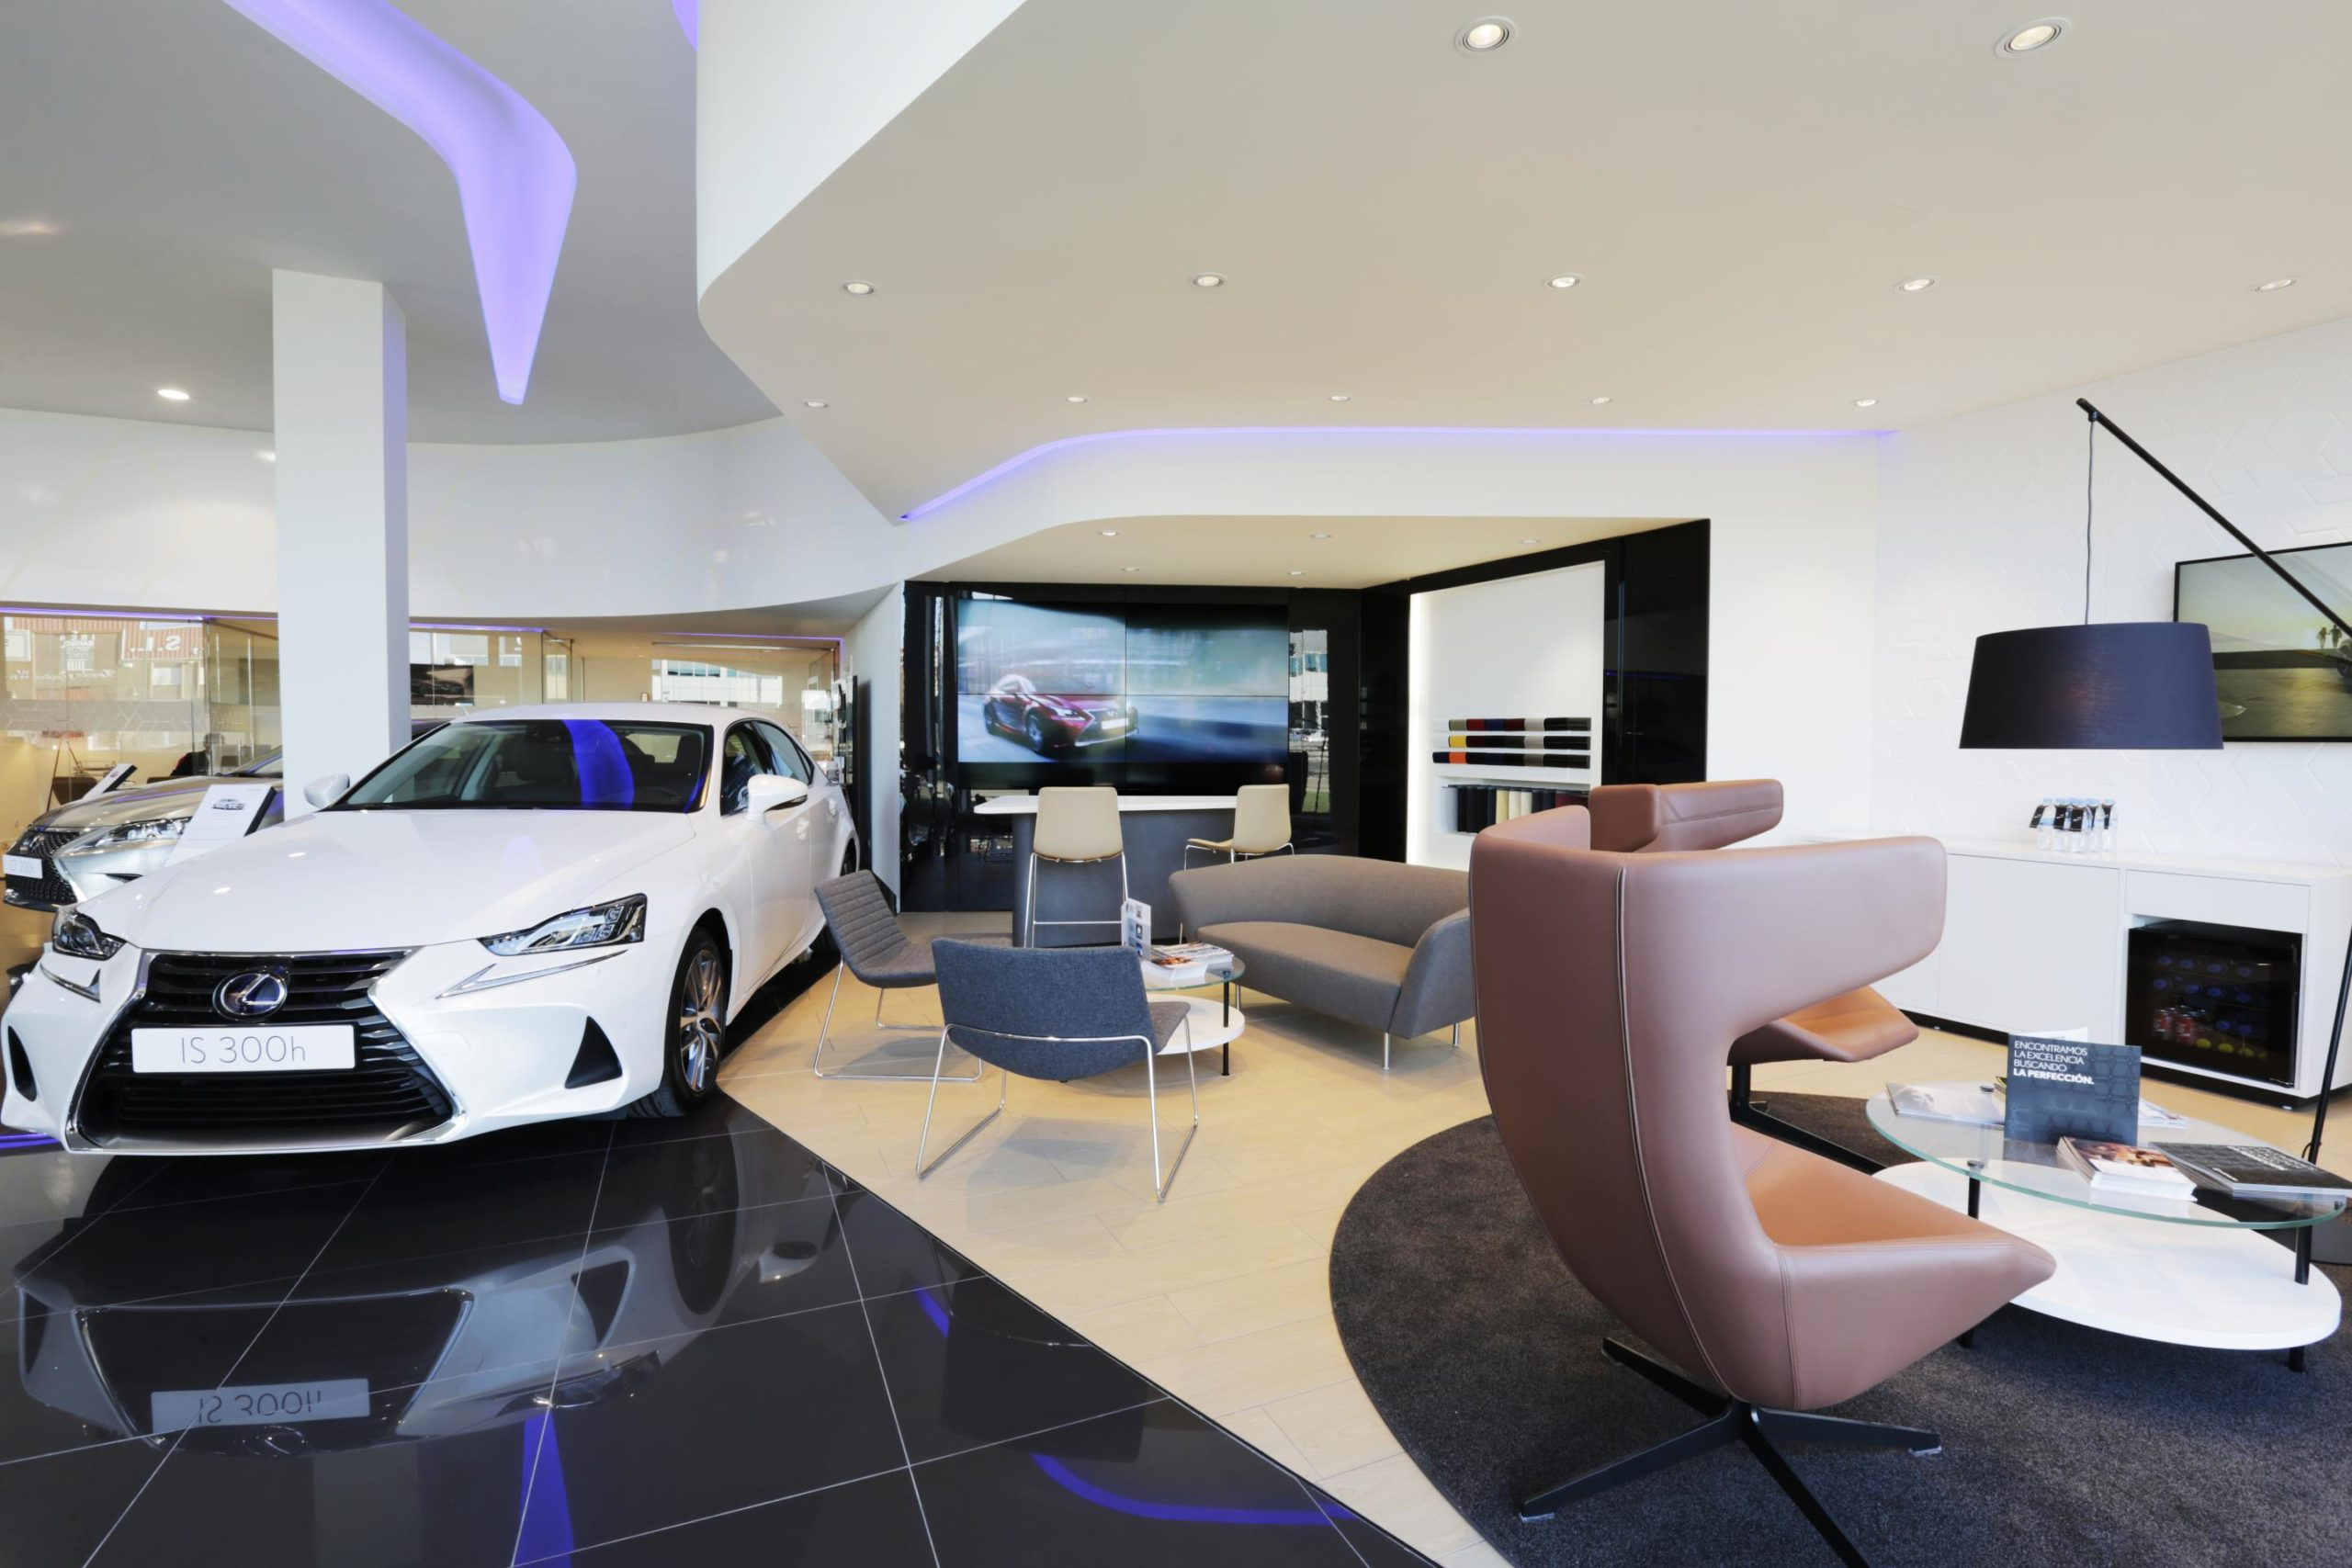 Apertura de parte de la red de Centros Autorizados Lexus